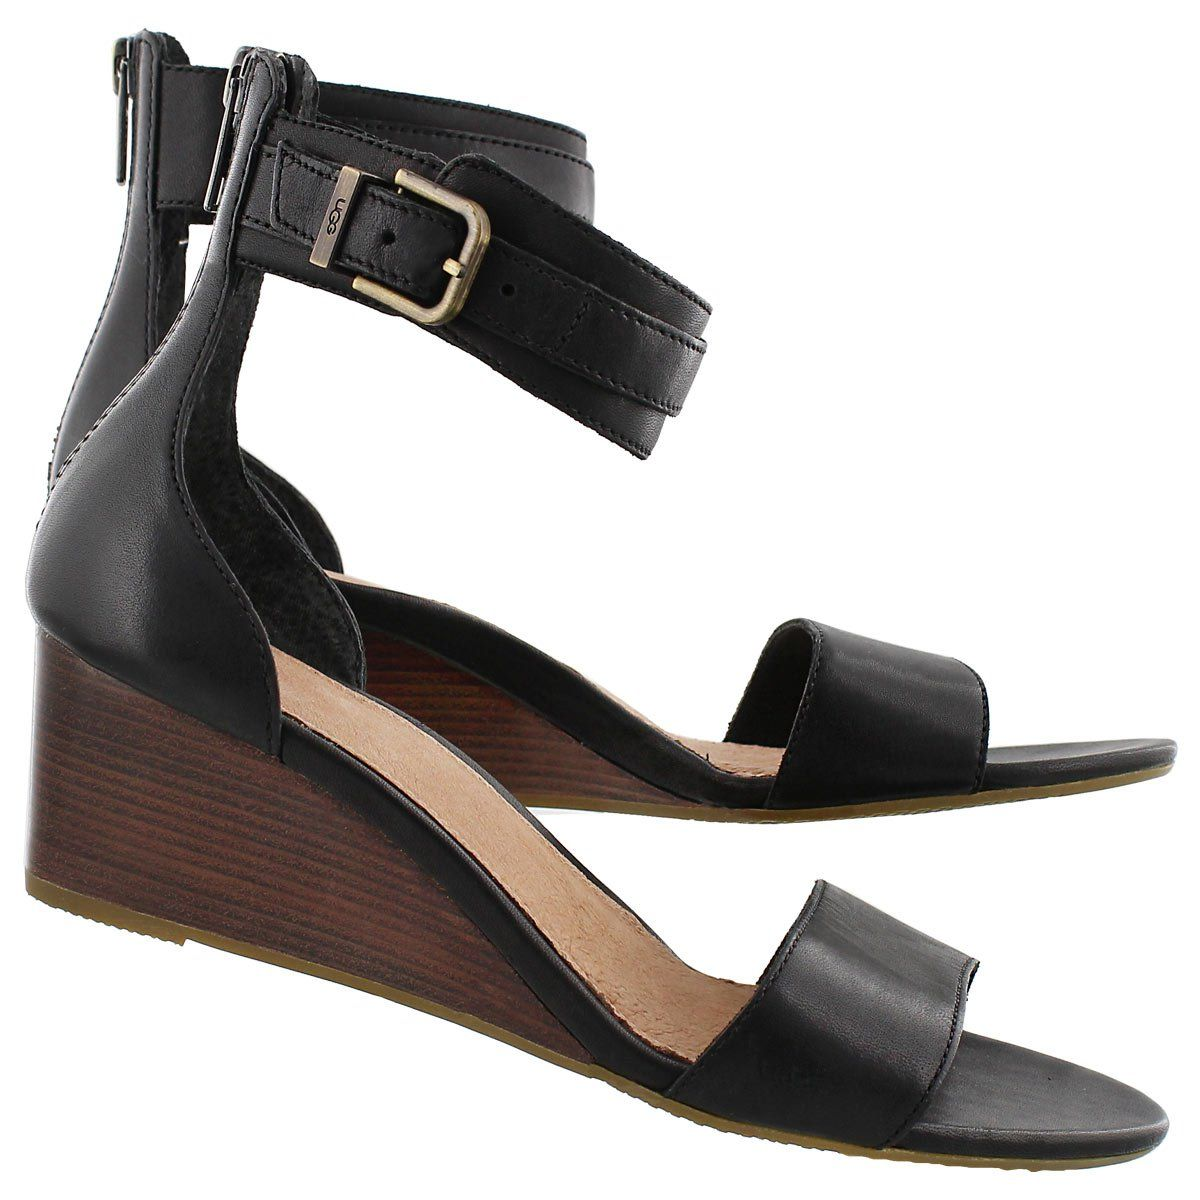 a7e17d4c84aa89 UGG Australia Women s CHAR black wedge ankle strap sandals 1009708 ...